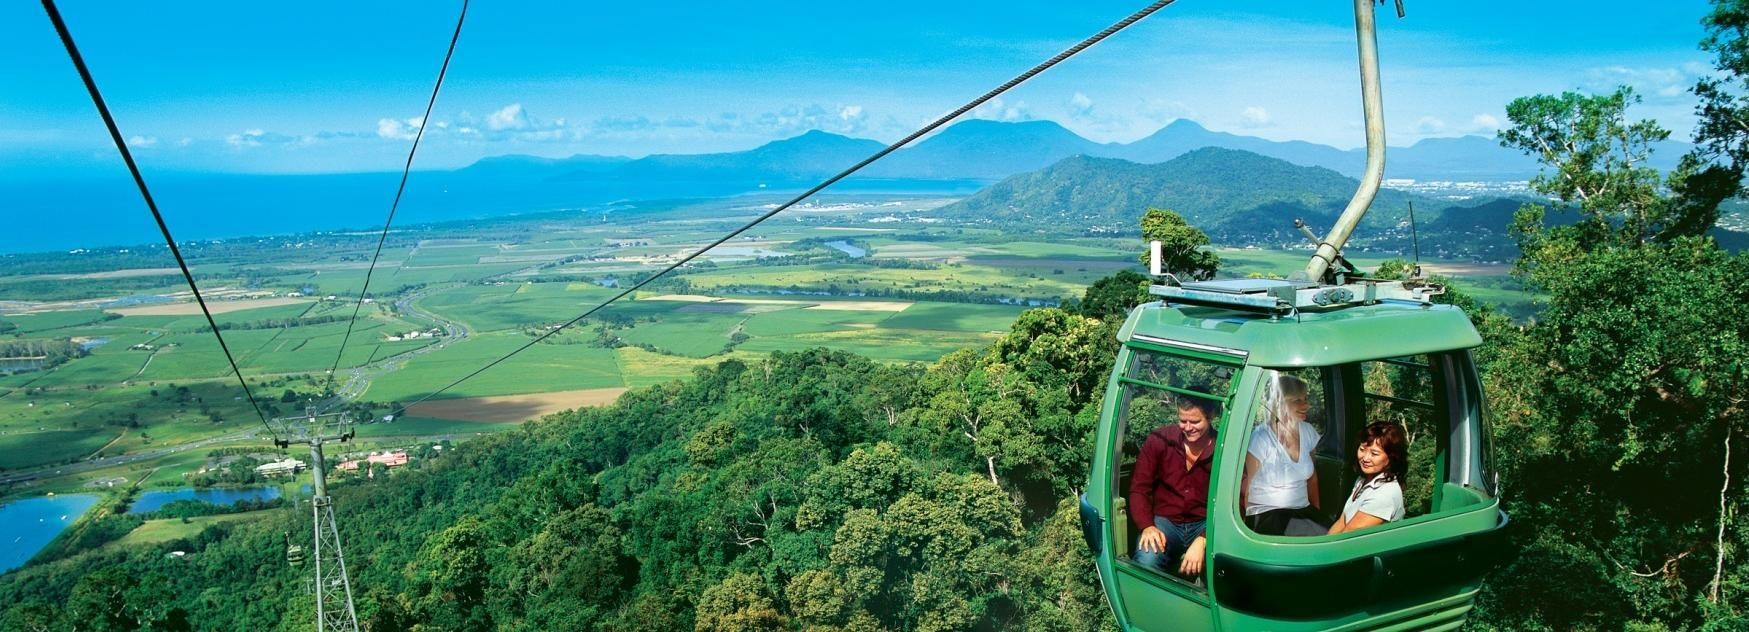 Cairns Day Tour: Green Island and Kuranda Skyrail & Train